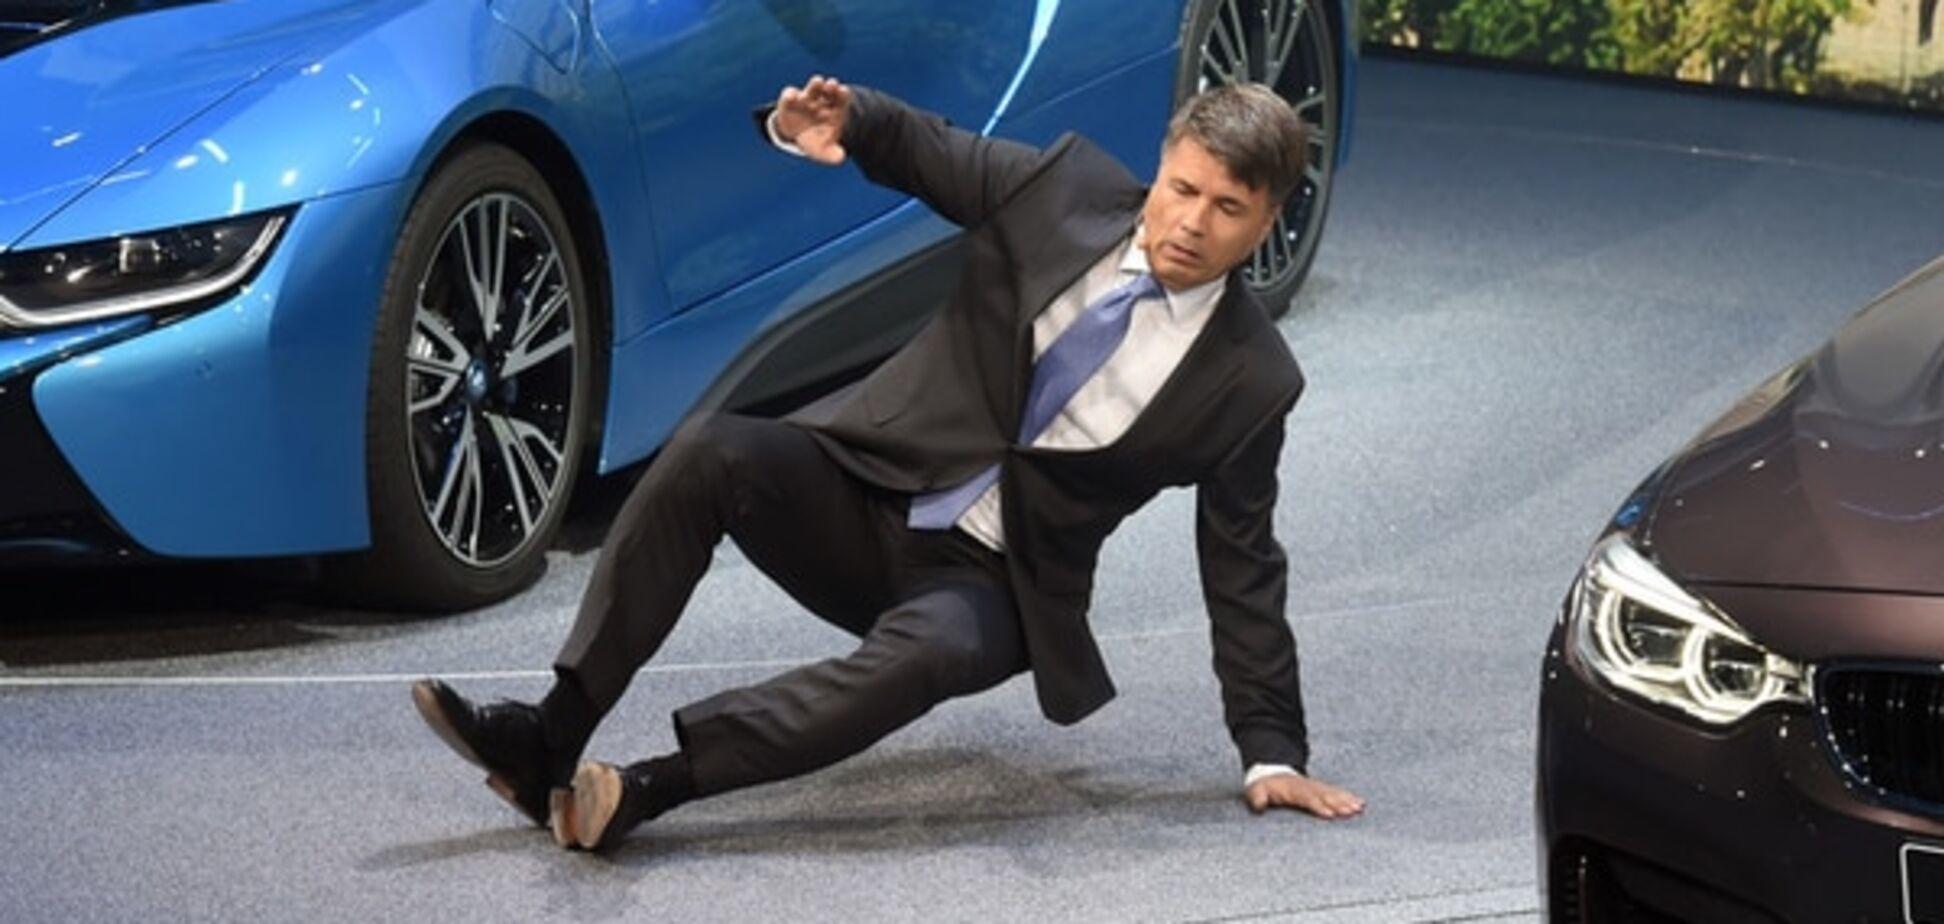 Франкфуртский автосалон: гендиректор BMW потерял сознание на презентации. Опубликованы фото